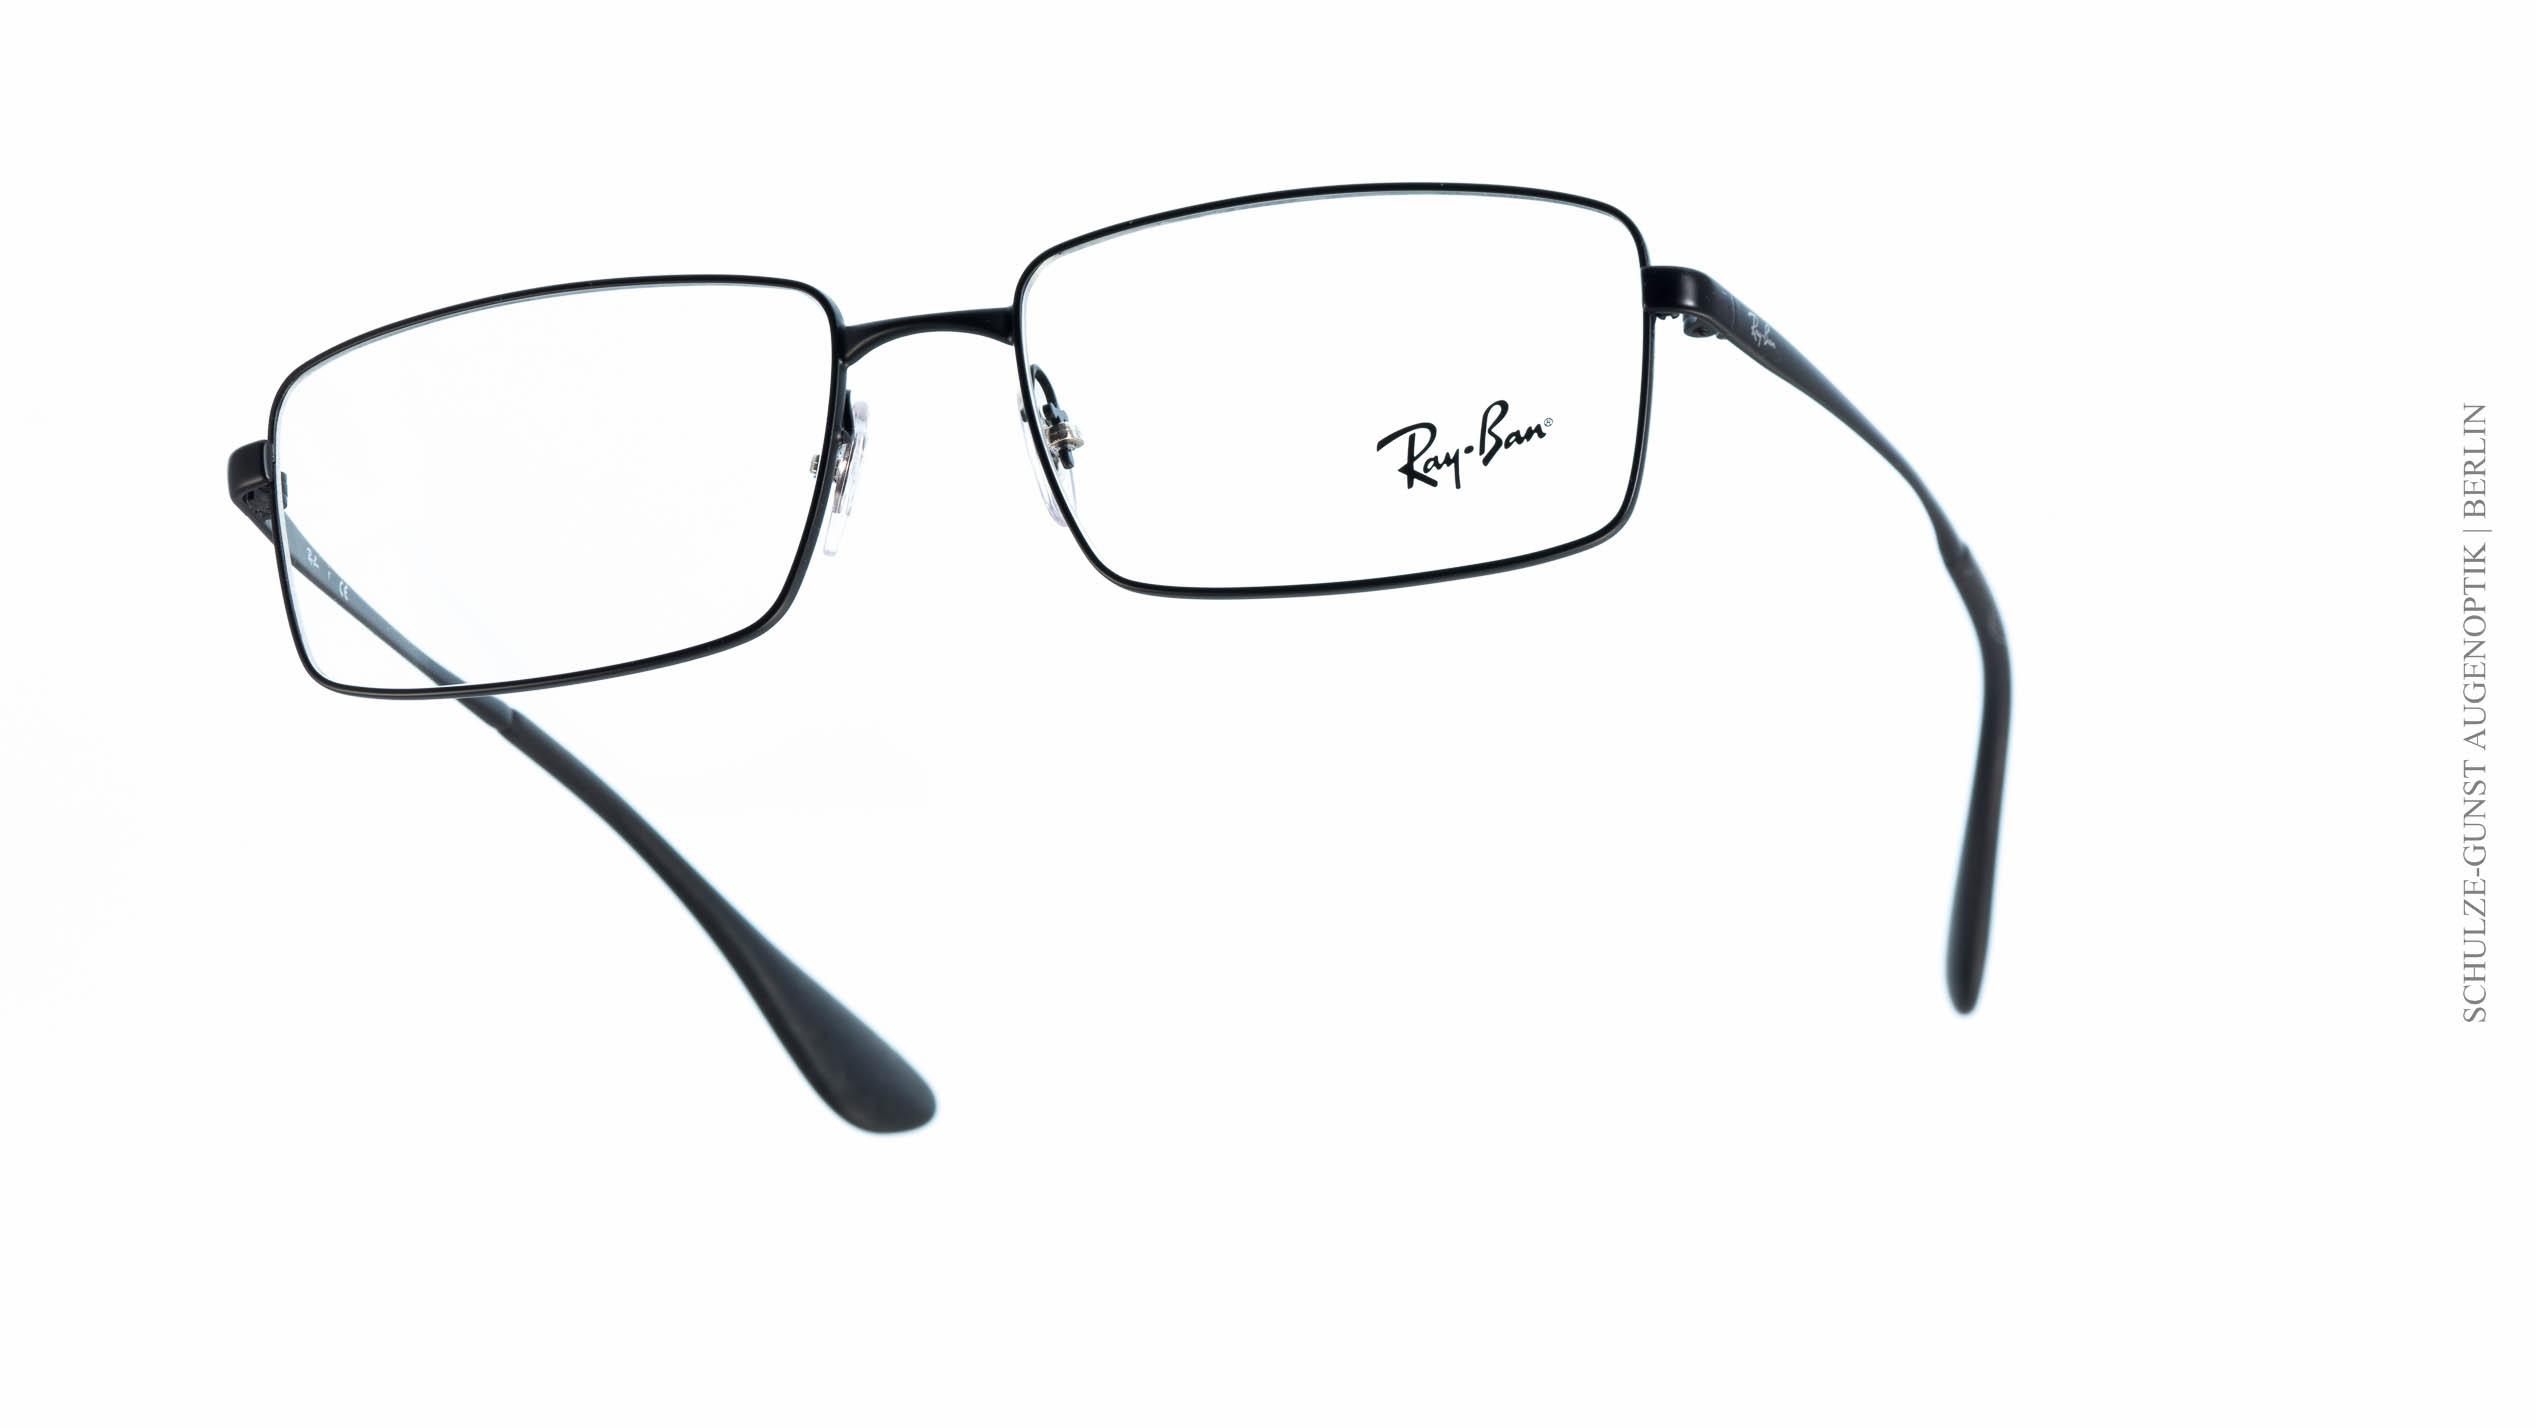 ray ban brillen metall